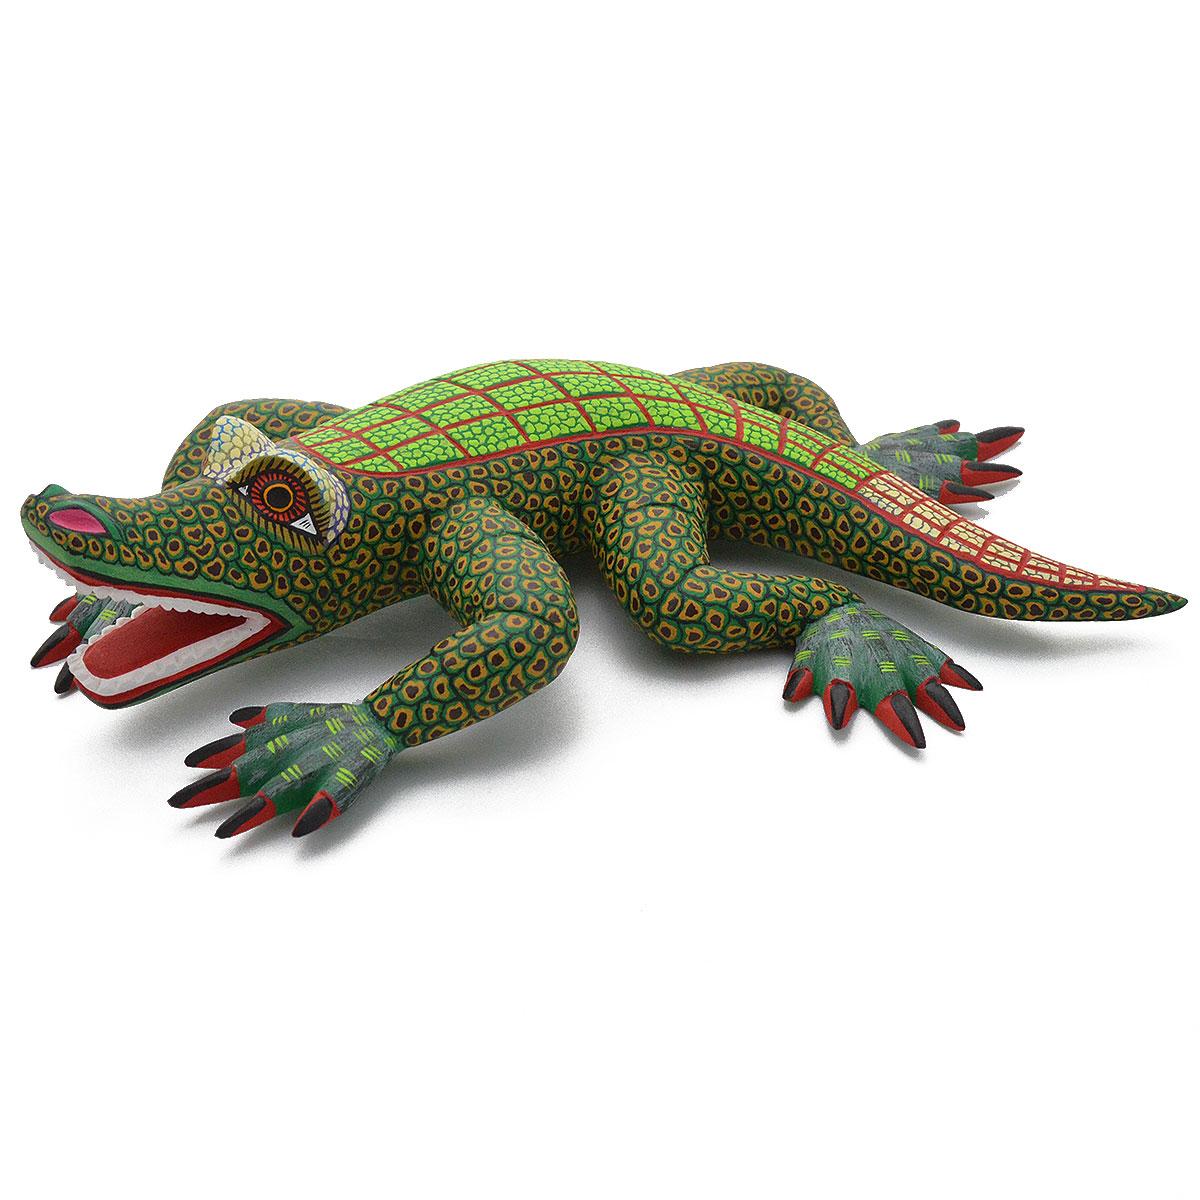 Damian & Beatriz Morales: Crocodile